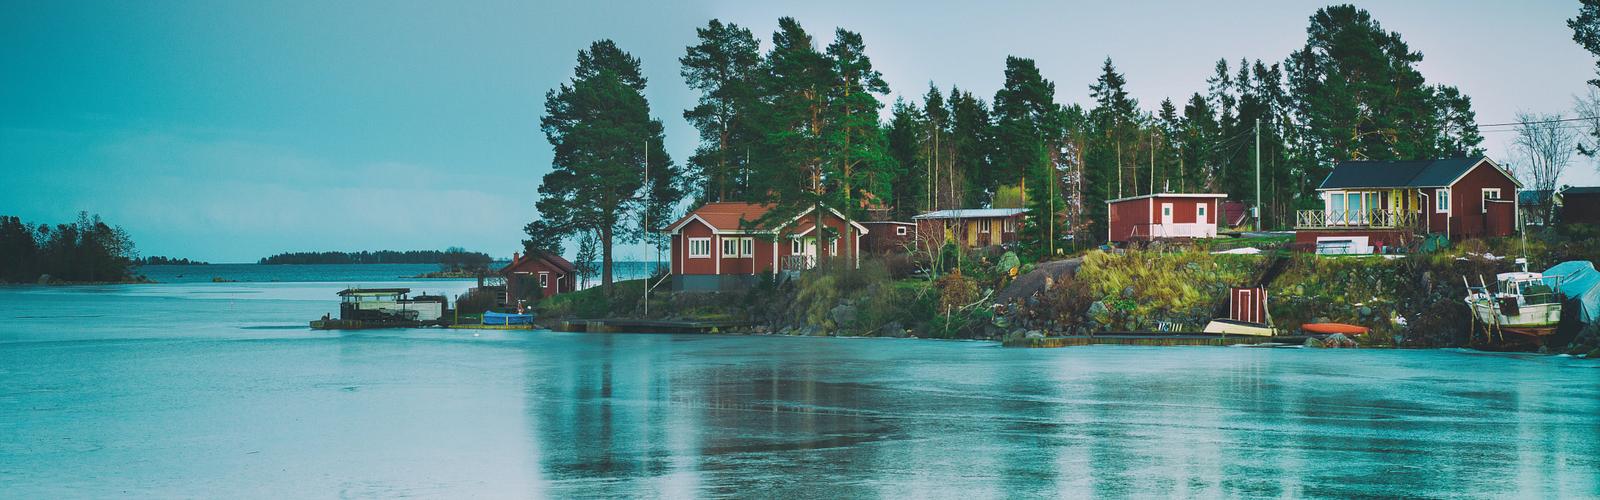 Nordic nature, island and lake